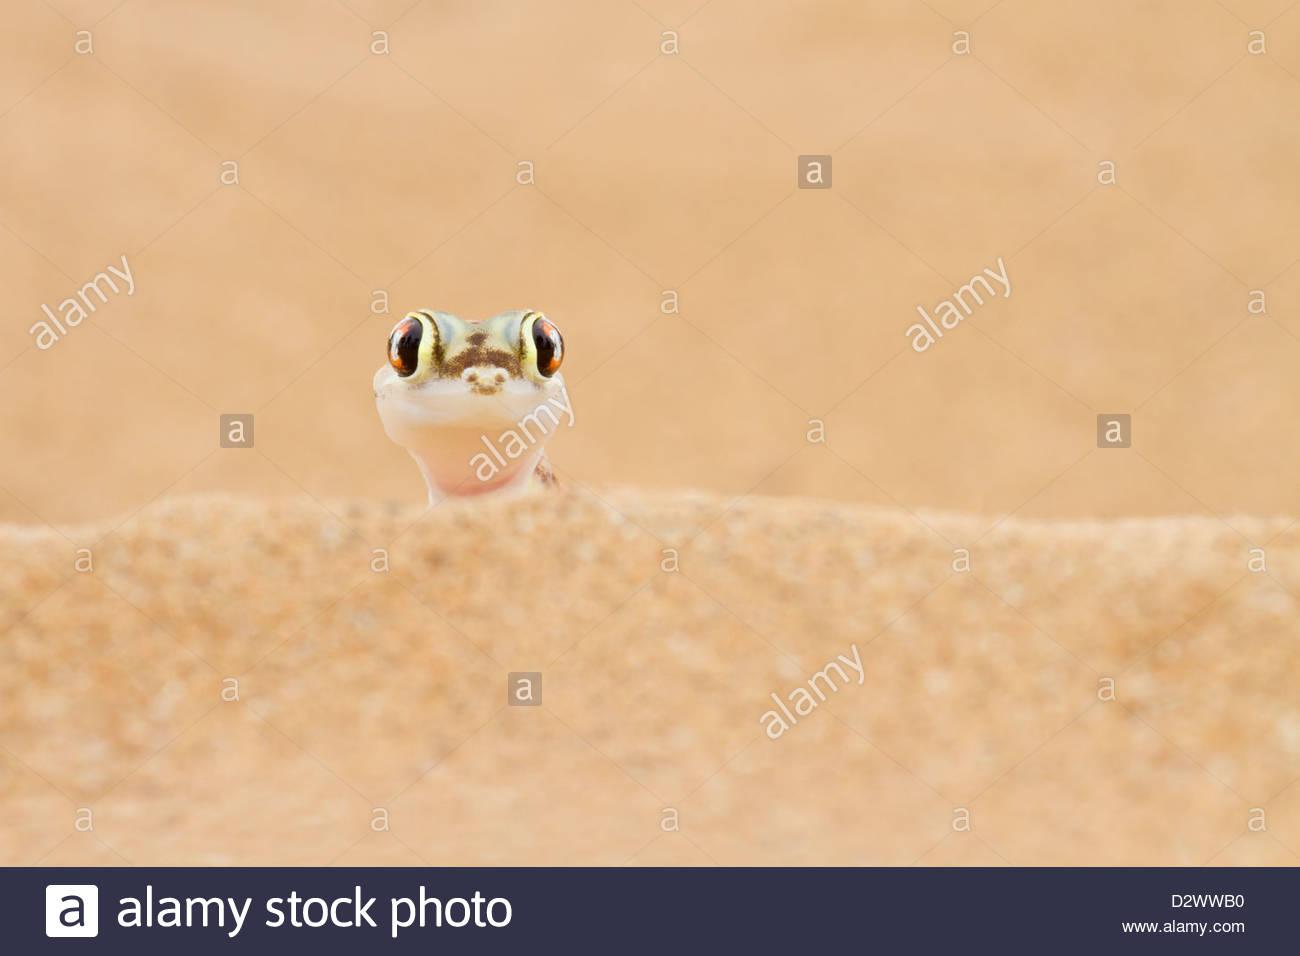 Palmato Gecko peering over a sand dune Stock Photo